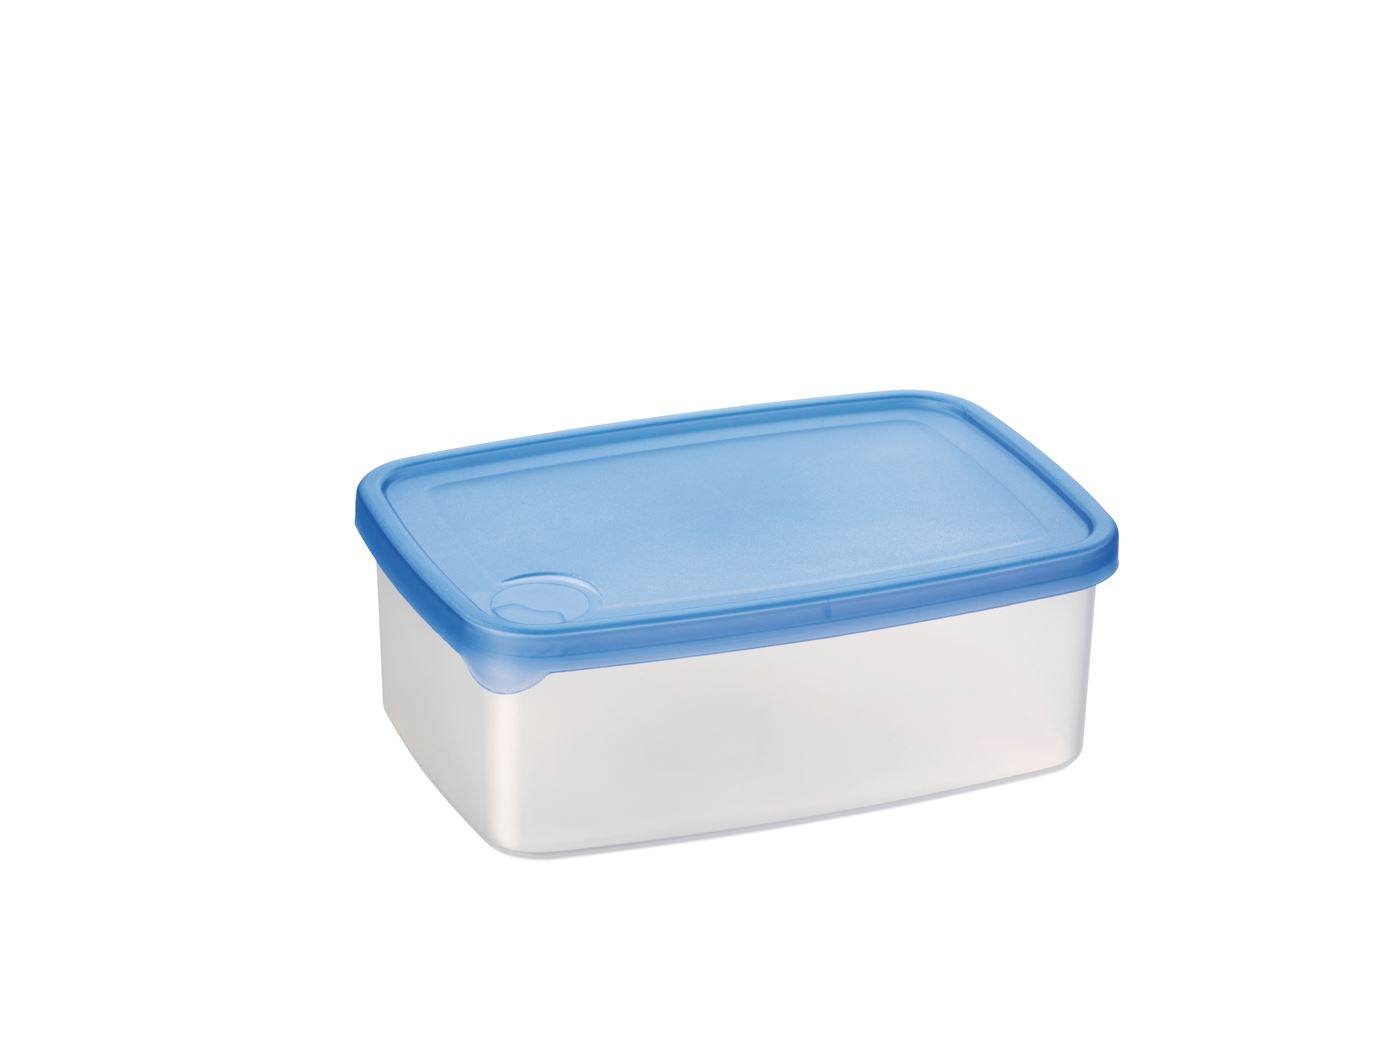 sunware club cuisine voorraaddoos transparant/transparant-blauw